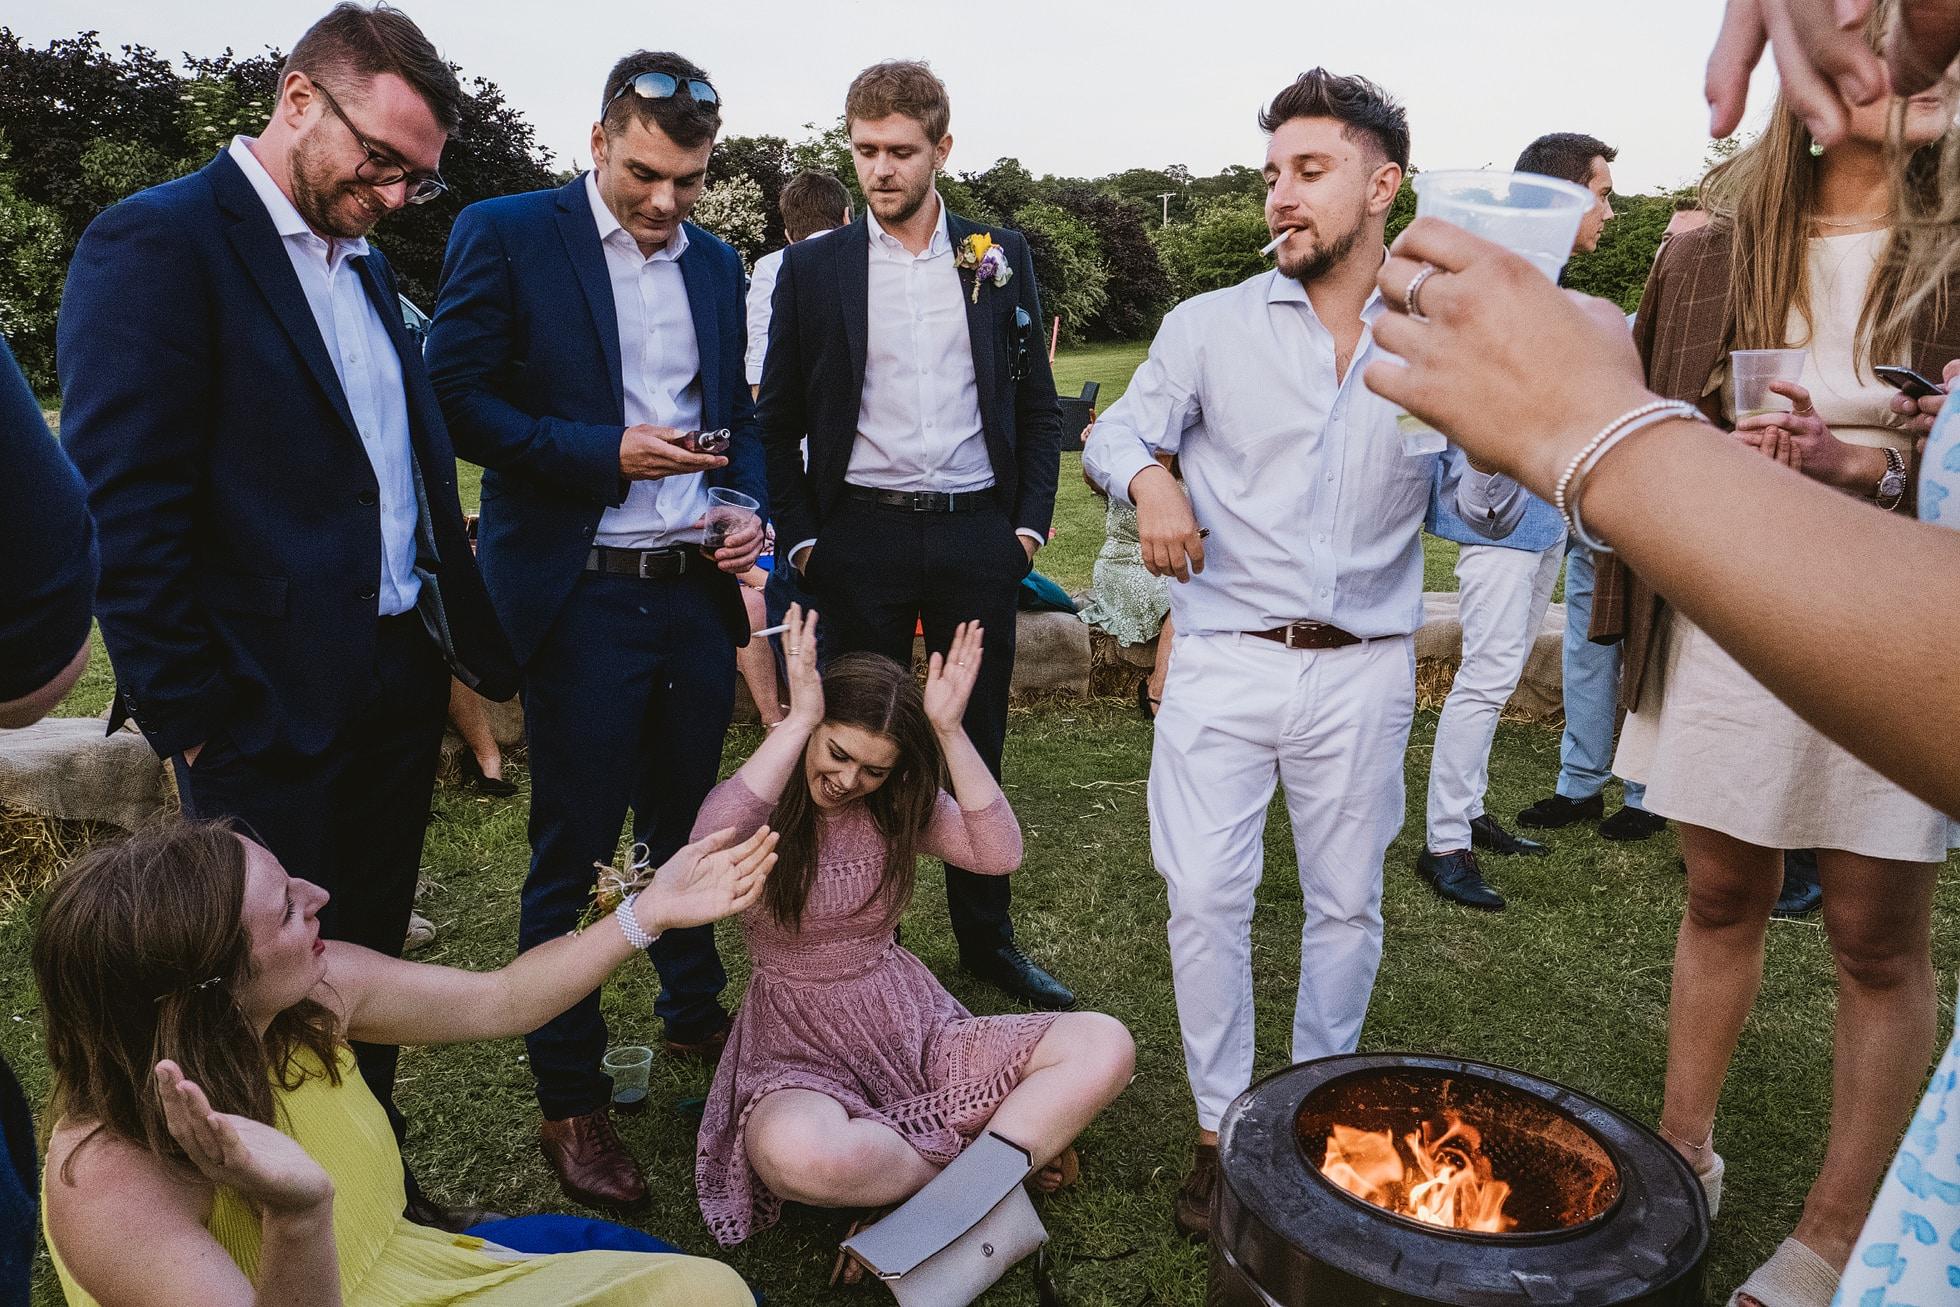 Outdoor Candid Wedding Photographers